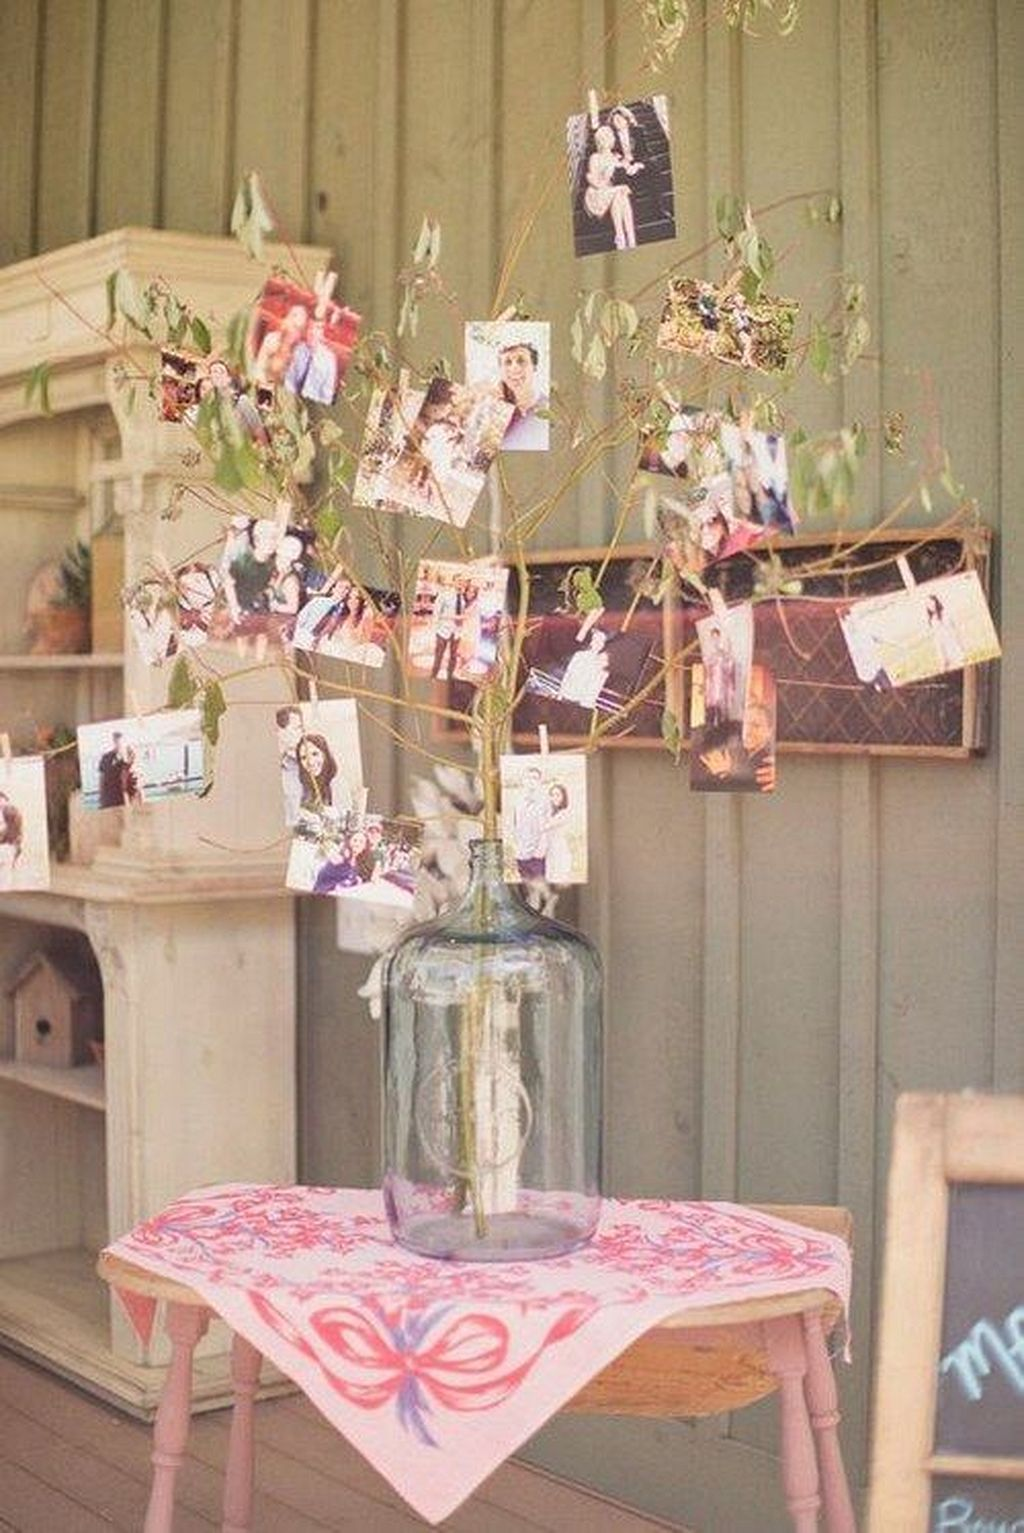 Wedding room decoration ideas 2018  Sneak peek bridal shower ideas    wedding  Pinterest